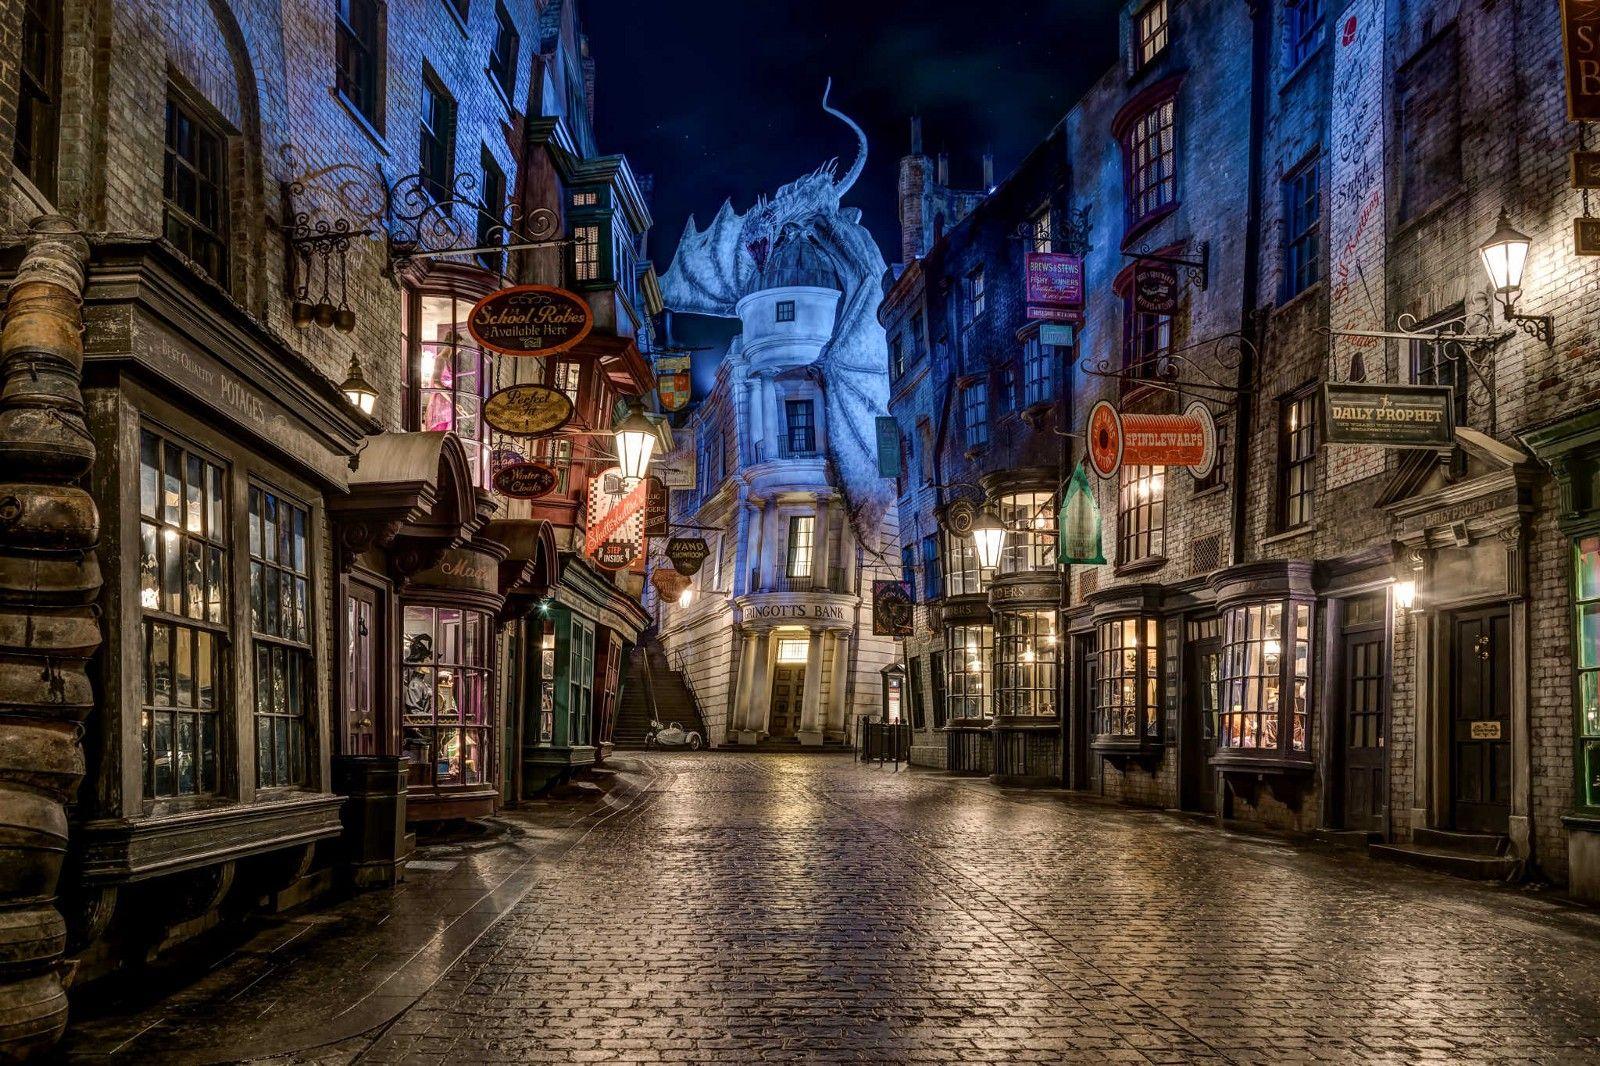 Quel parc d'attraction visiter à Orlando ? Universal Studios vs Island of Adventure